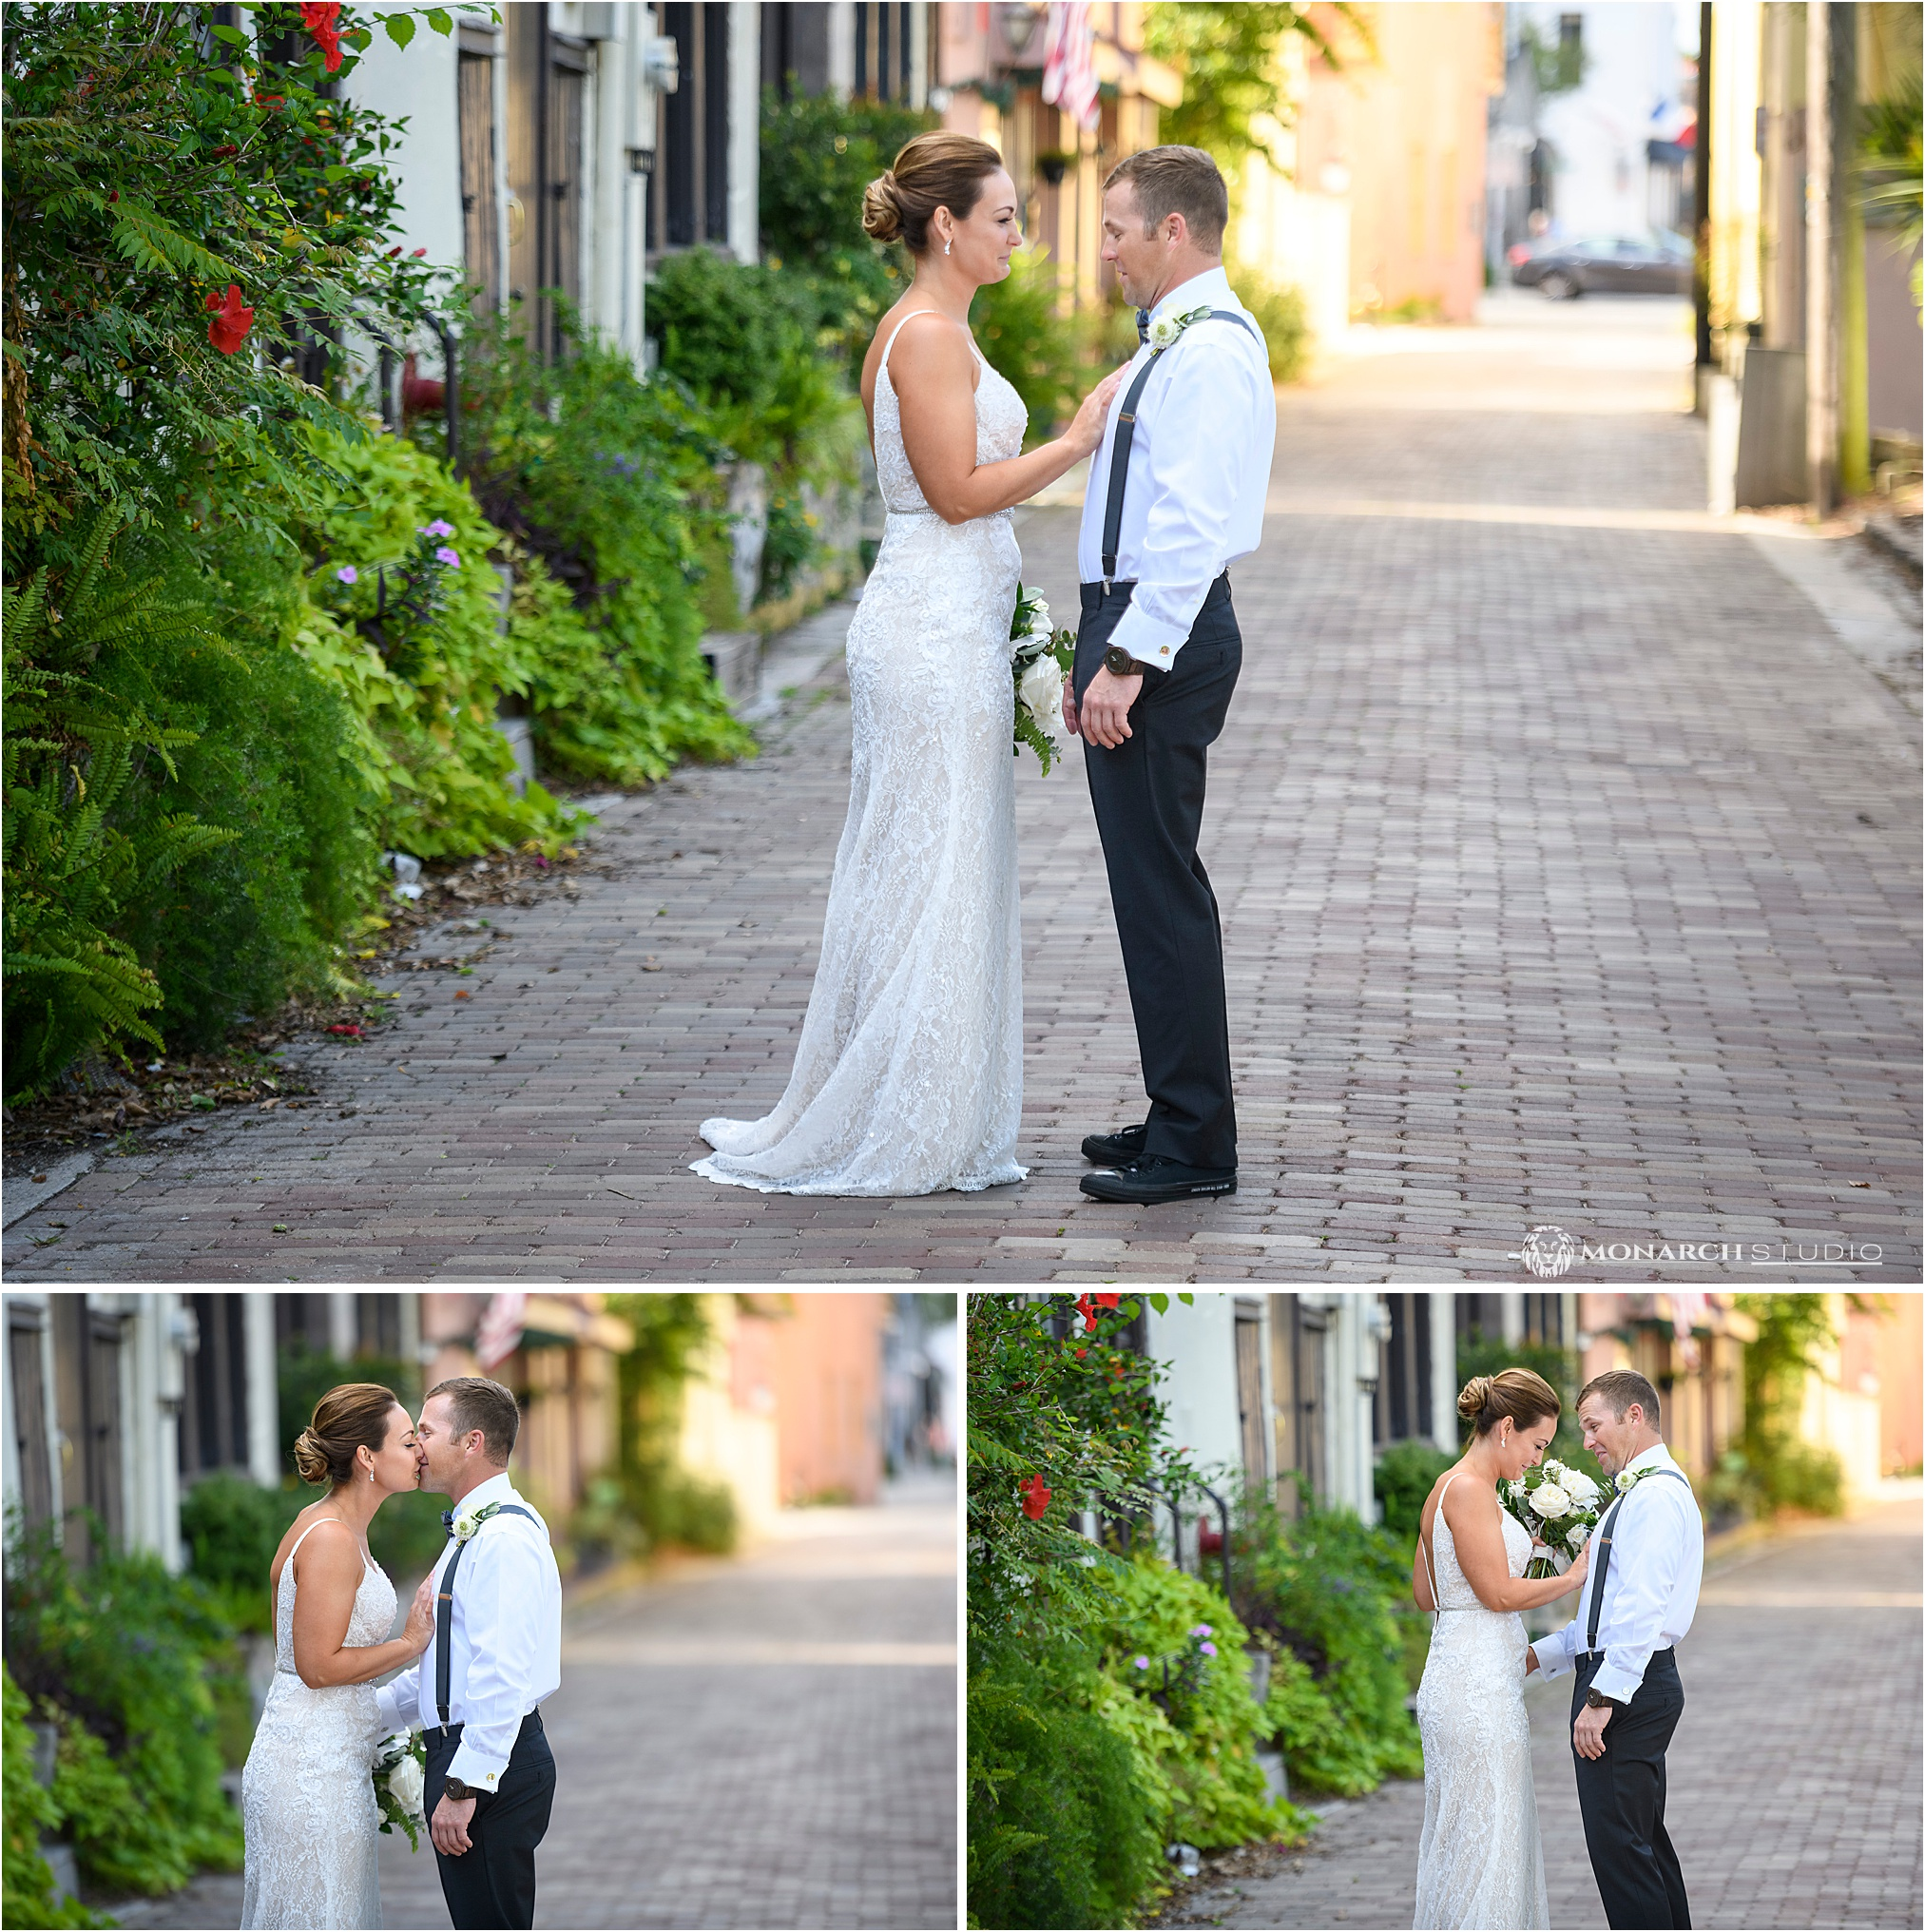 042-whiteroom-wedding-photographer-2019-05-22_0024.jpg